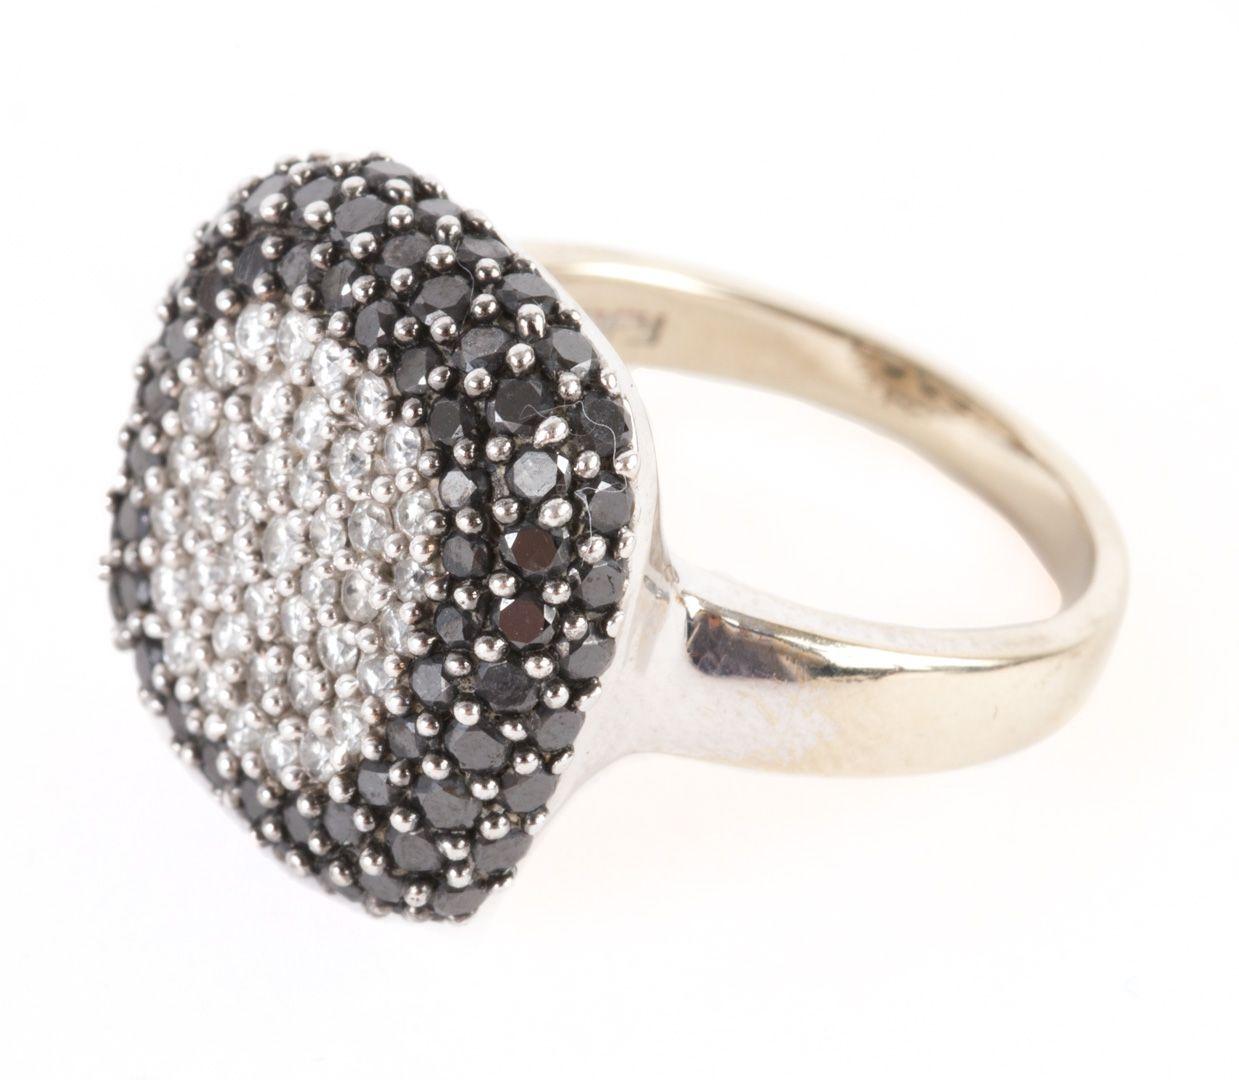 Lady's White and Black Diamond Ring